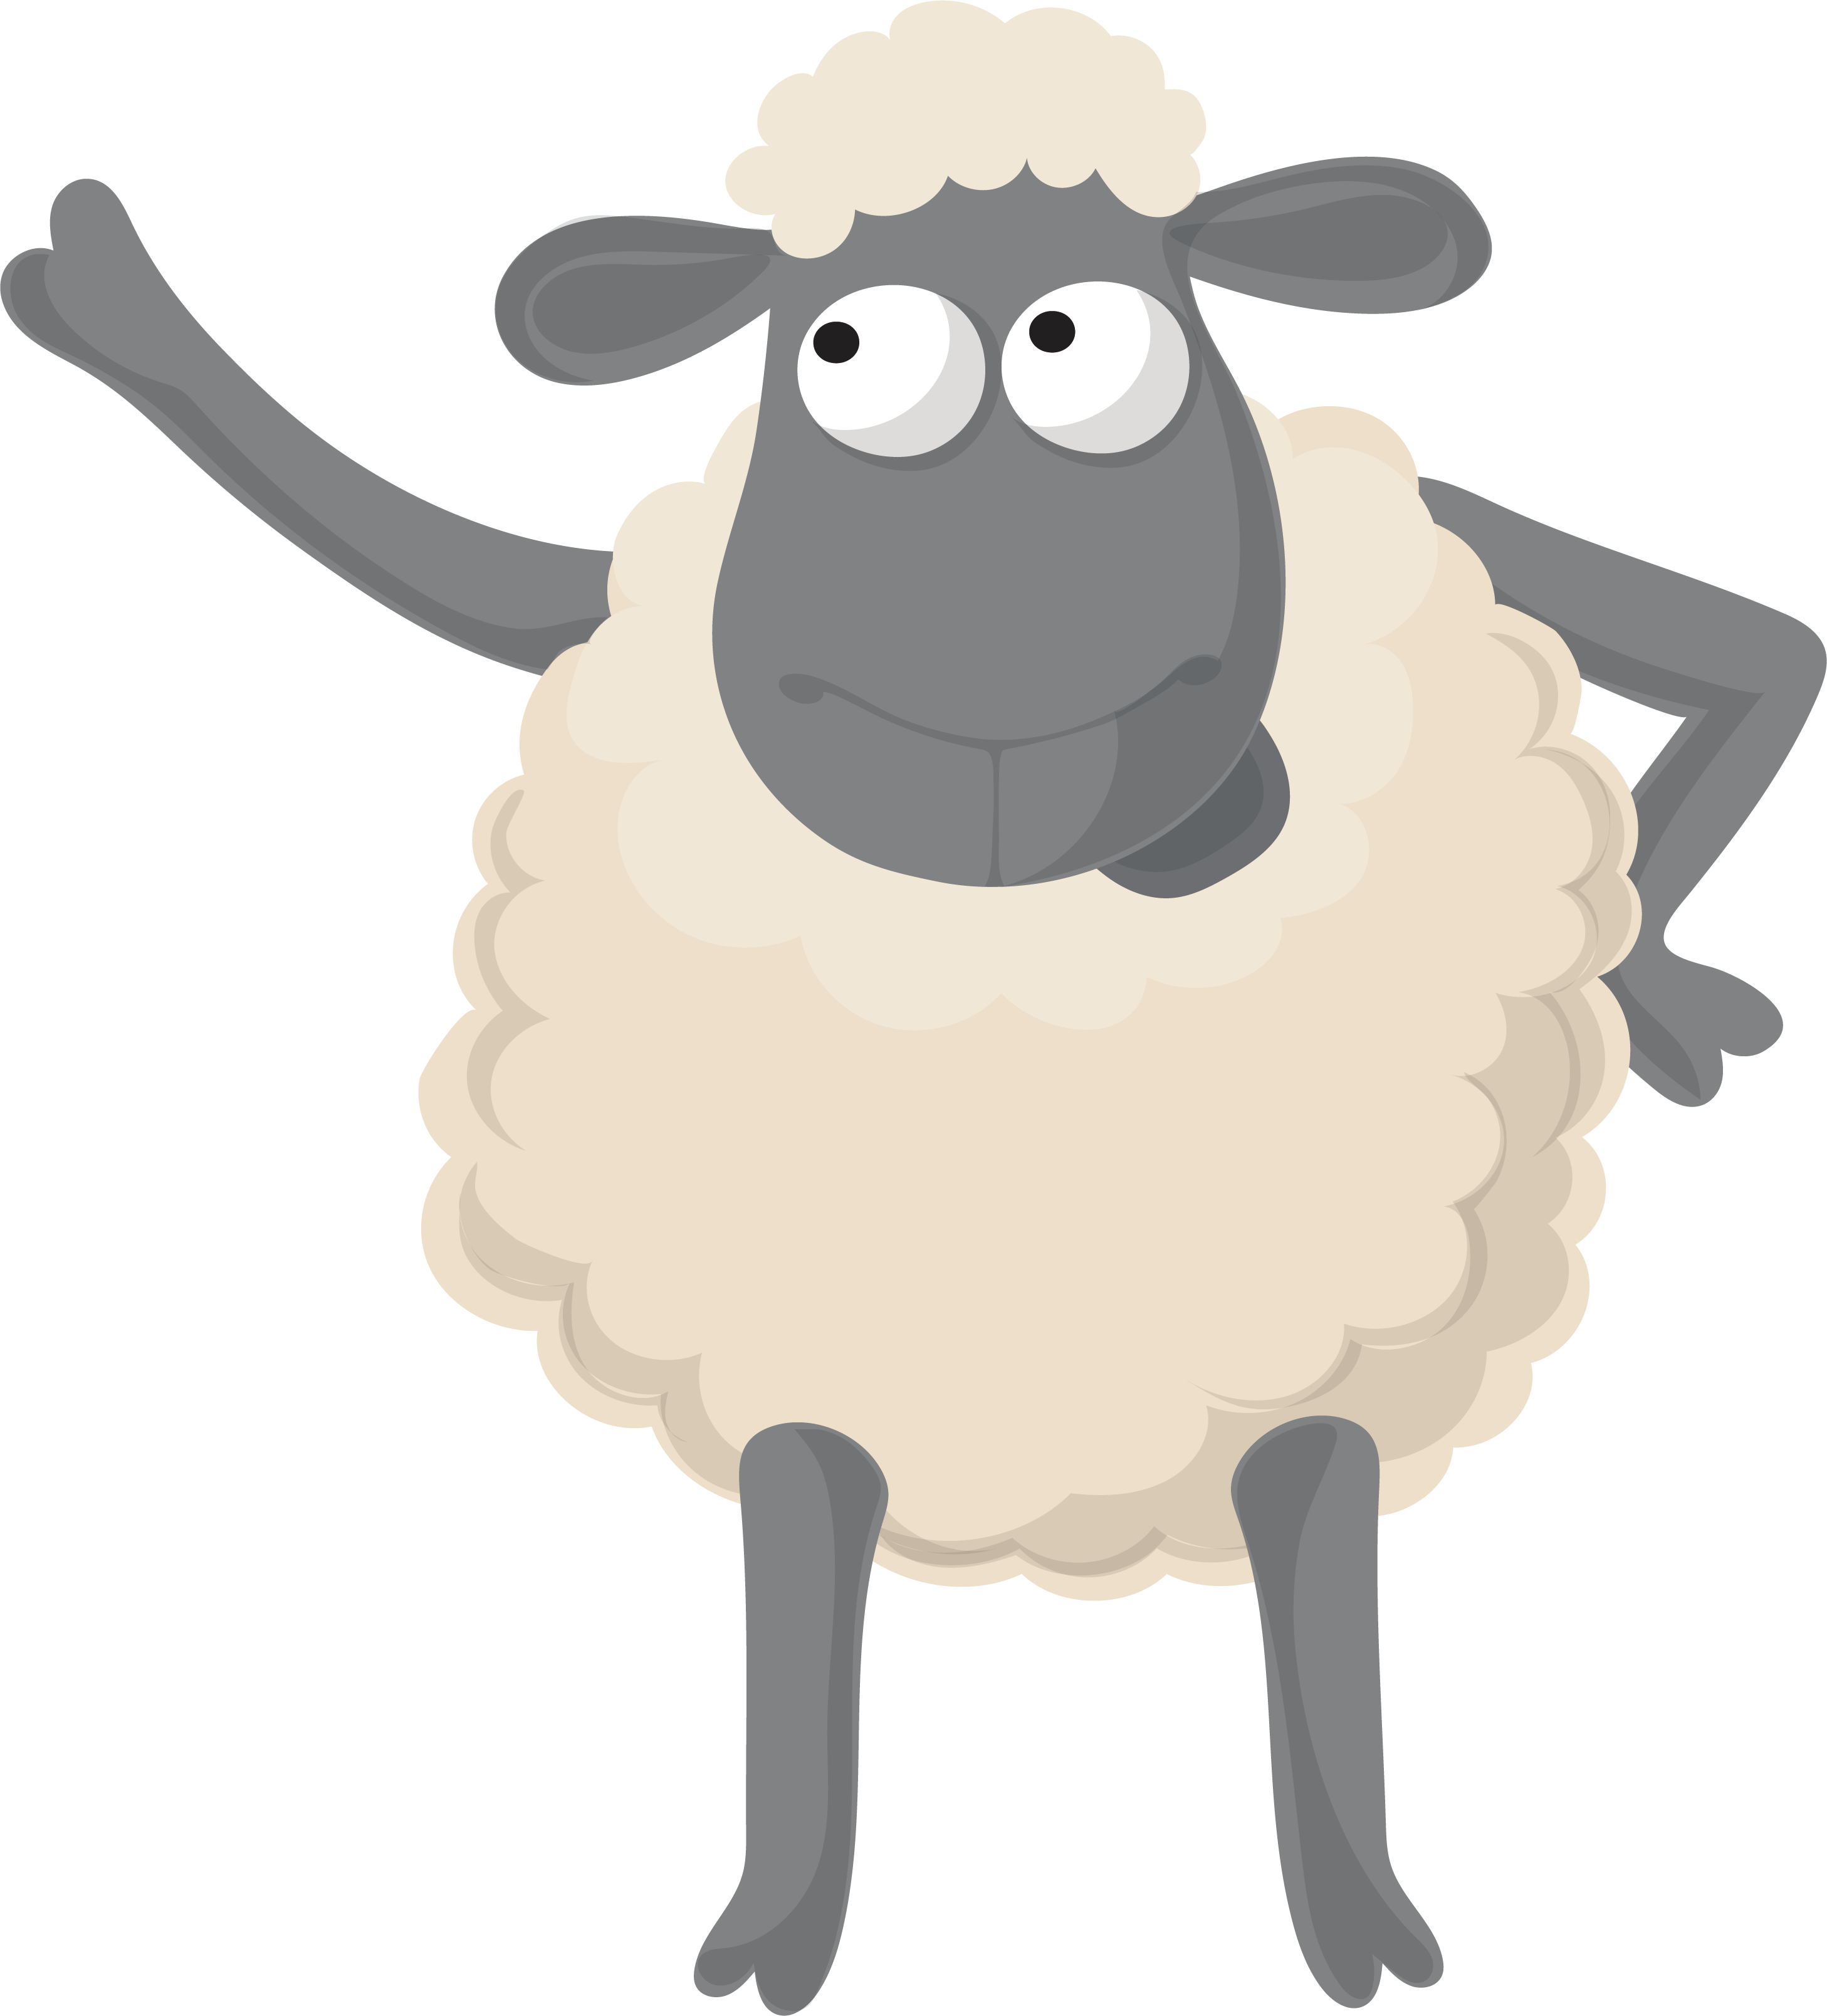 Al fitr mubarak islam. Clipart sheep eid ul adha